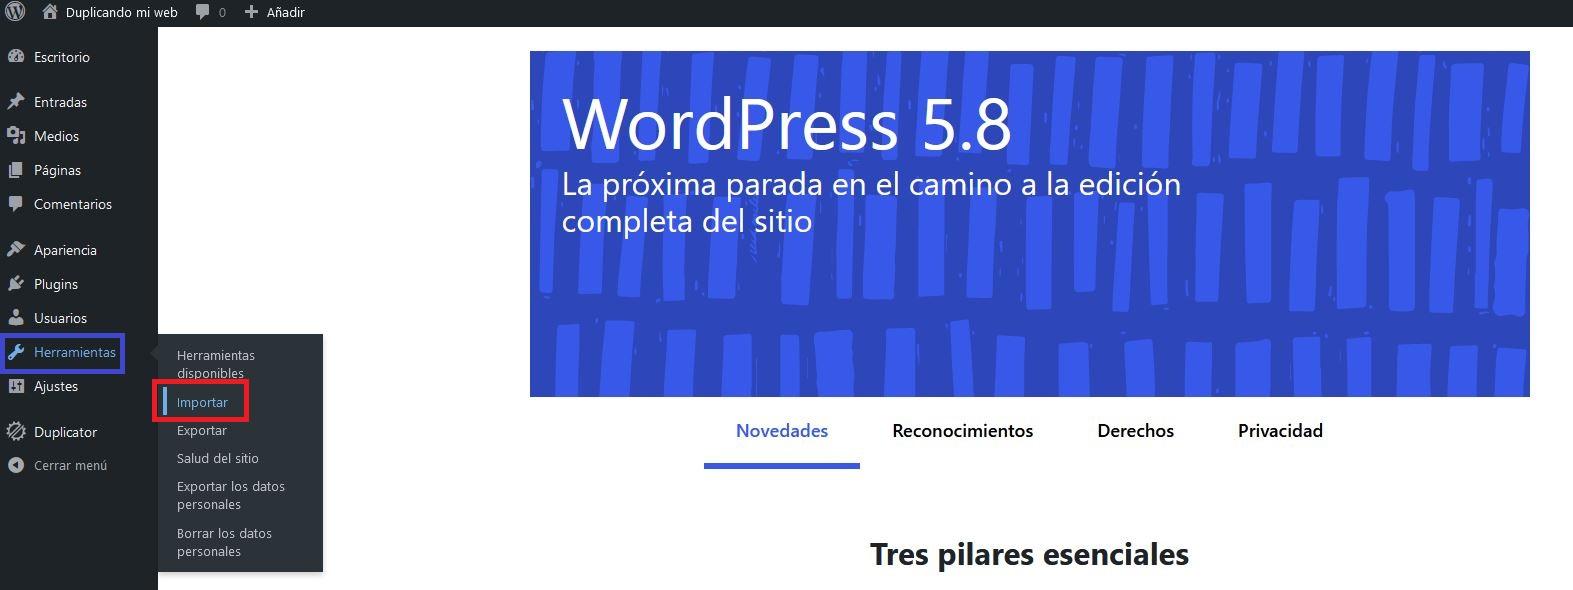 Herramienta importar de WordPress